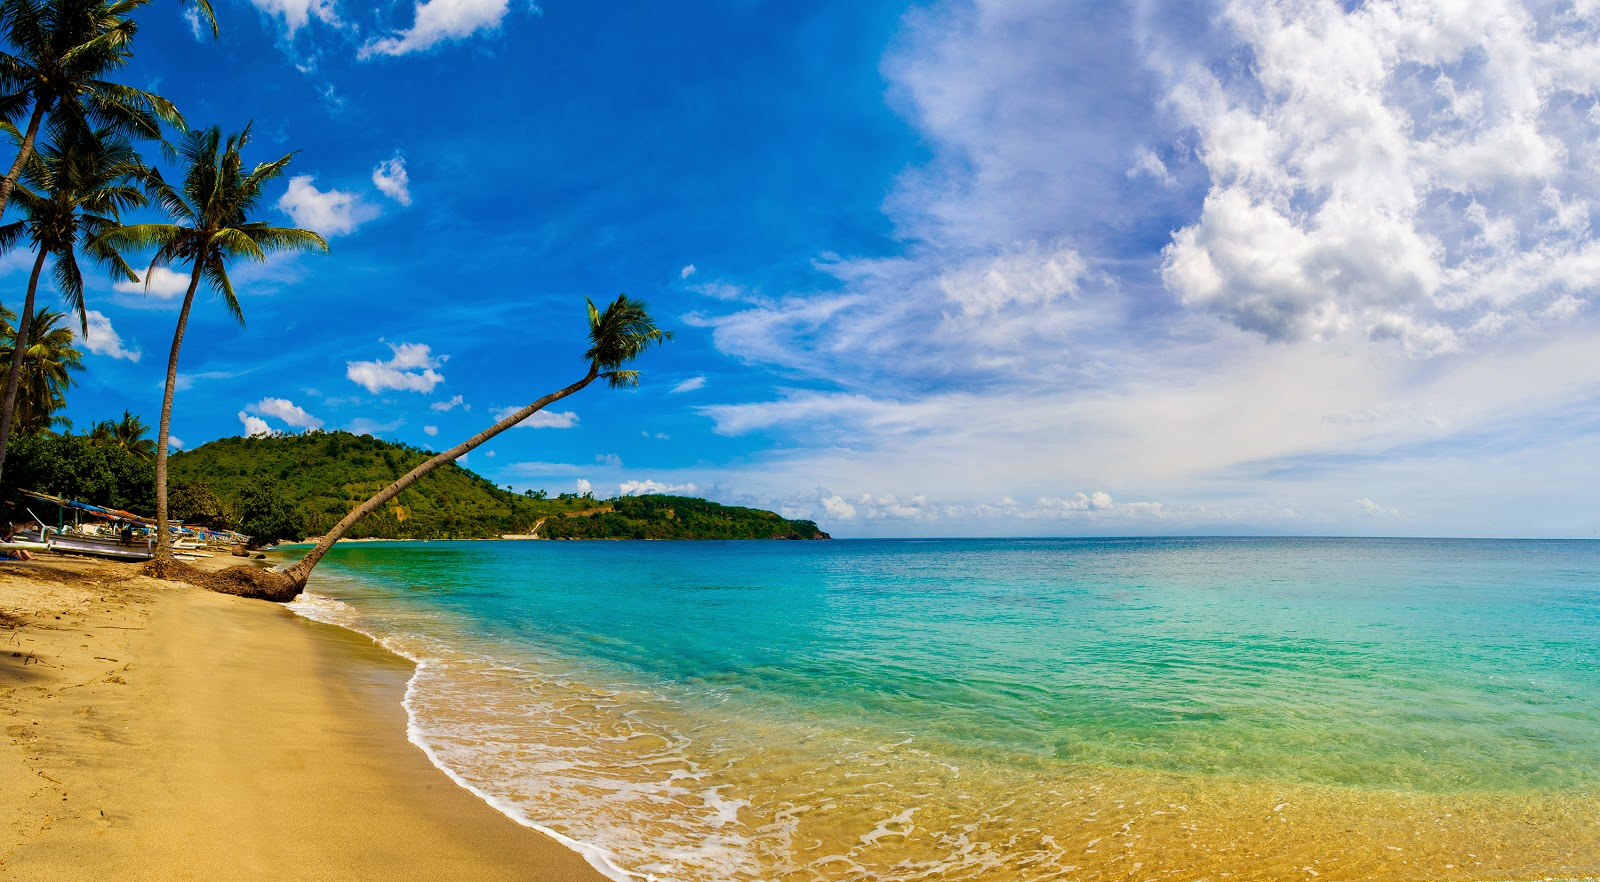 lombok-beach-indonesia-wallpaper.jpg